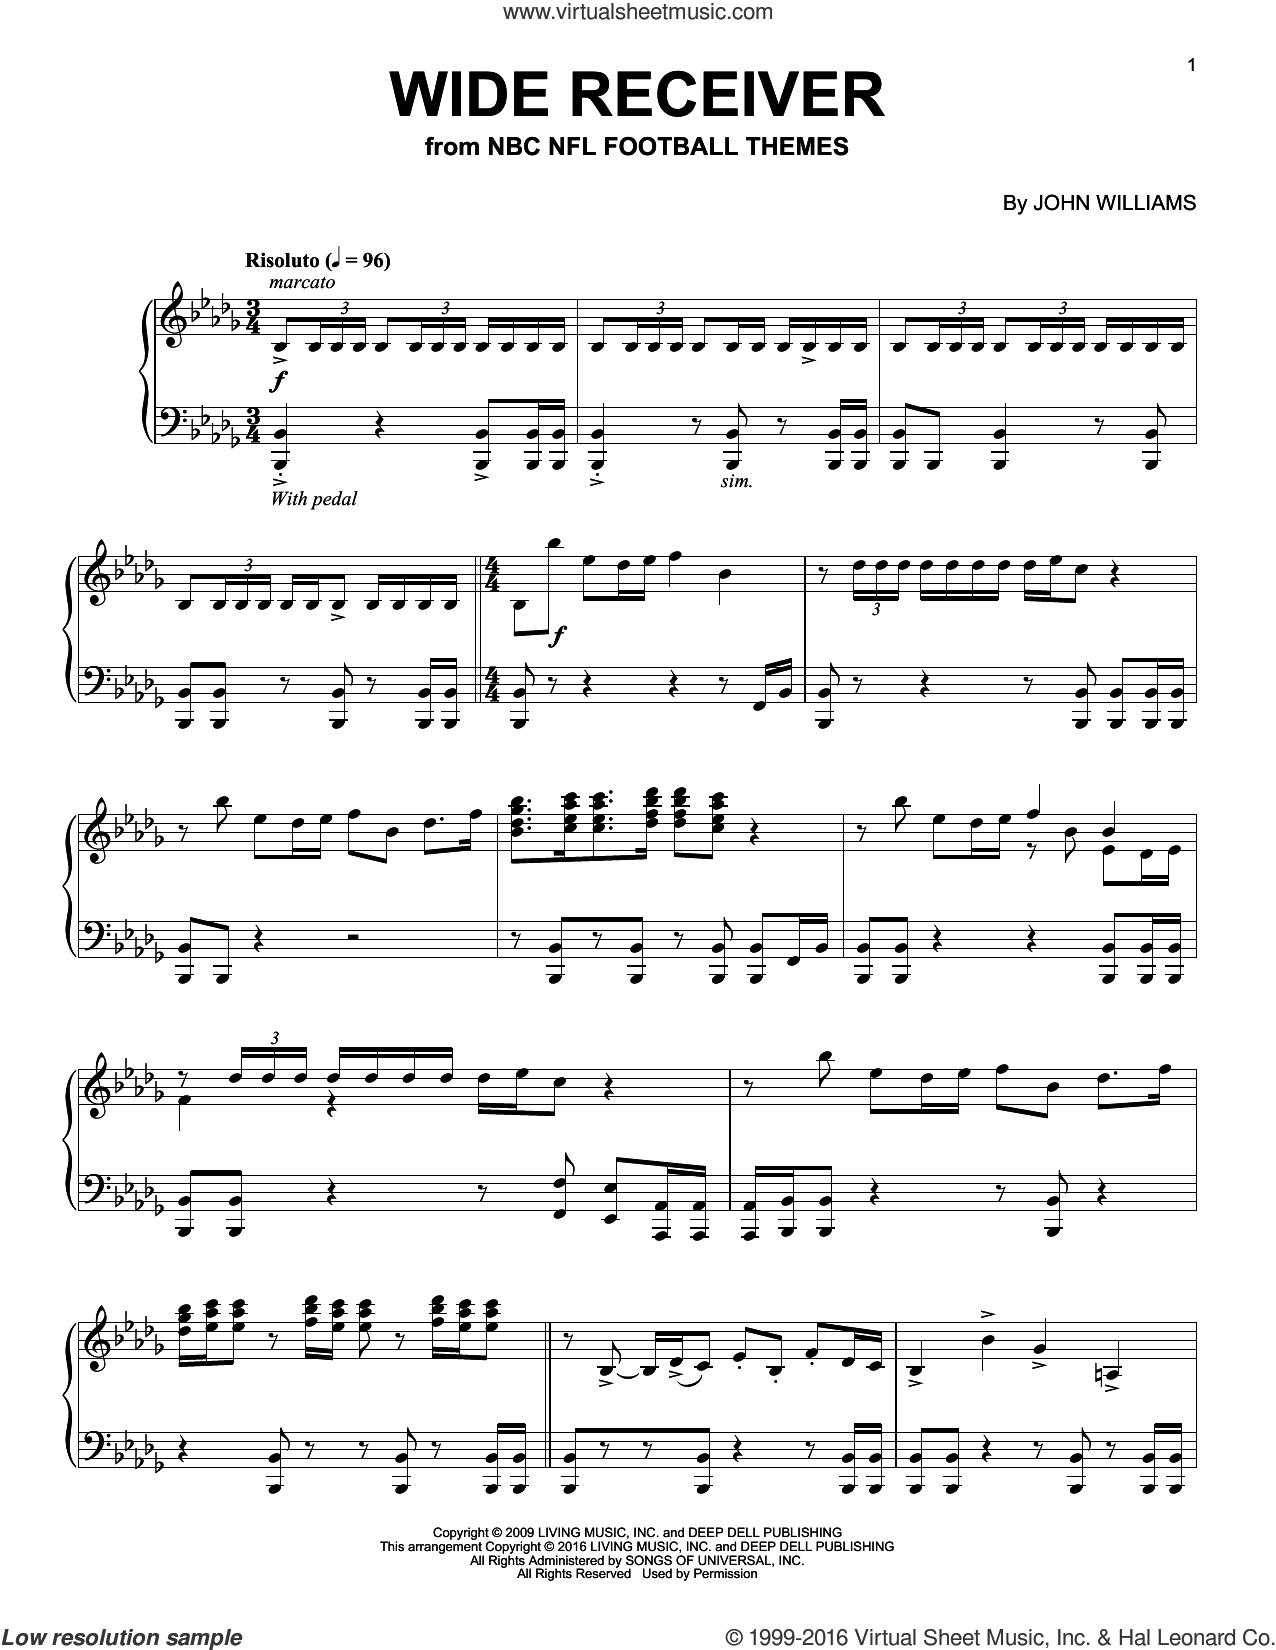 Wide Receiver sheet music for piano solo by John Williams, intermediate skill level